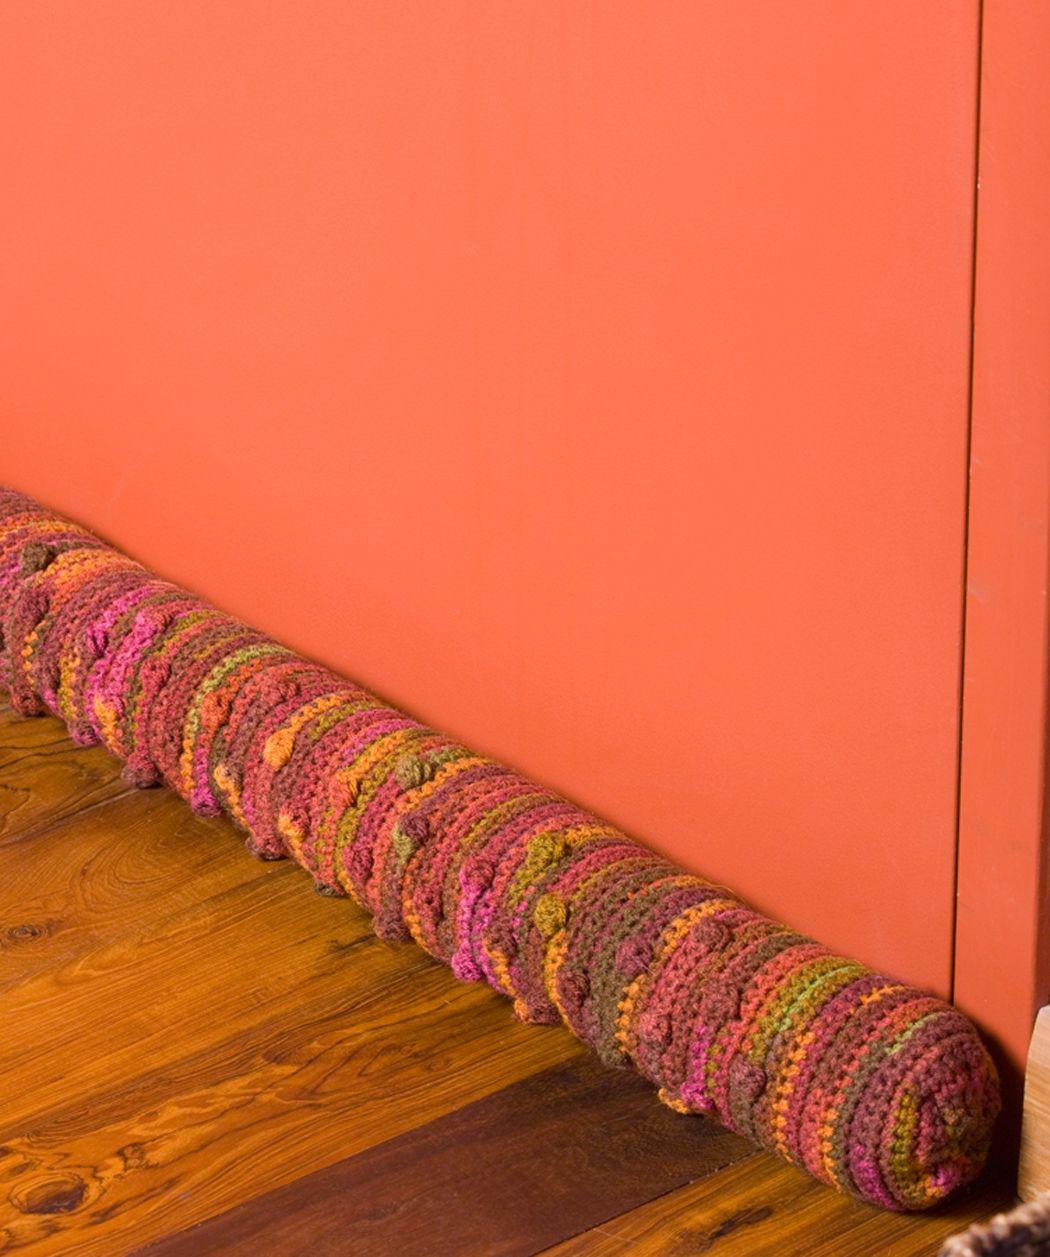 Draft Dodger Free Door Draft Pillow Crochet Pattern from Red Heart ...